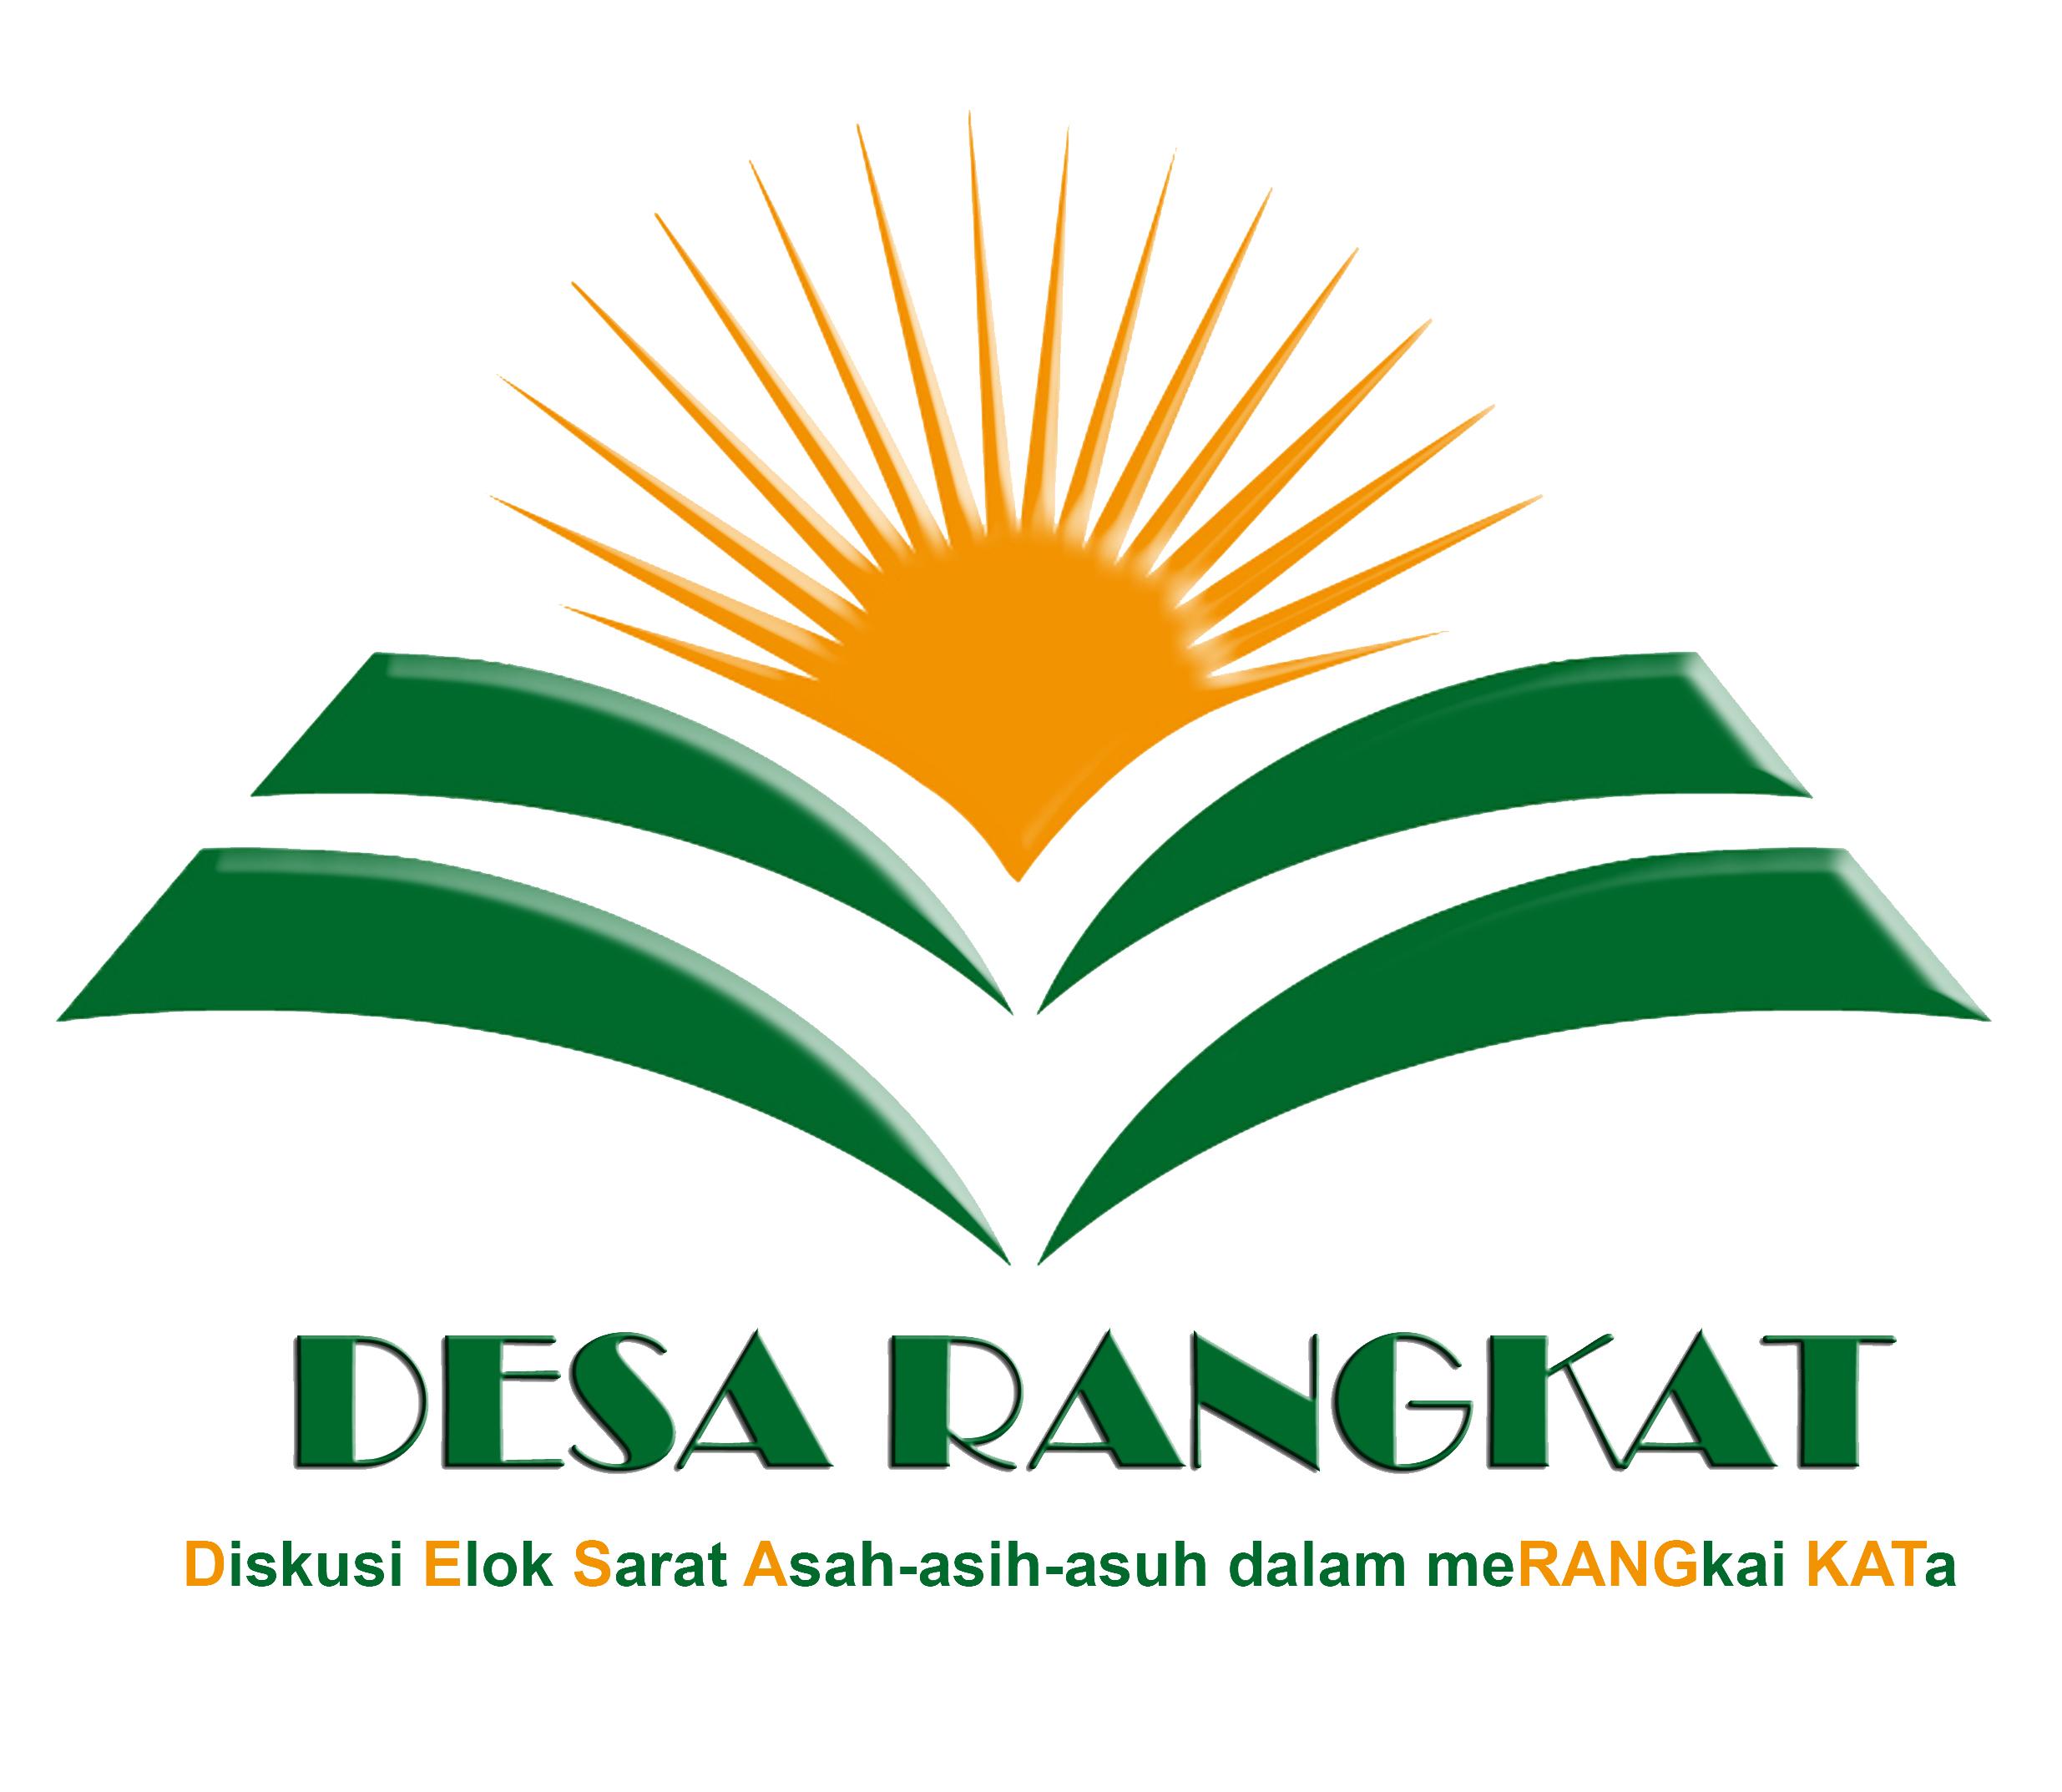 items/kaleidoskop_2020/desa-rangkat-hires-1607599541.jpg